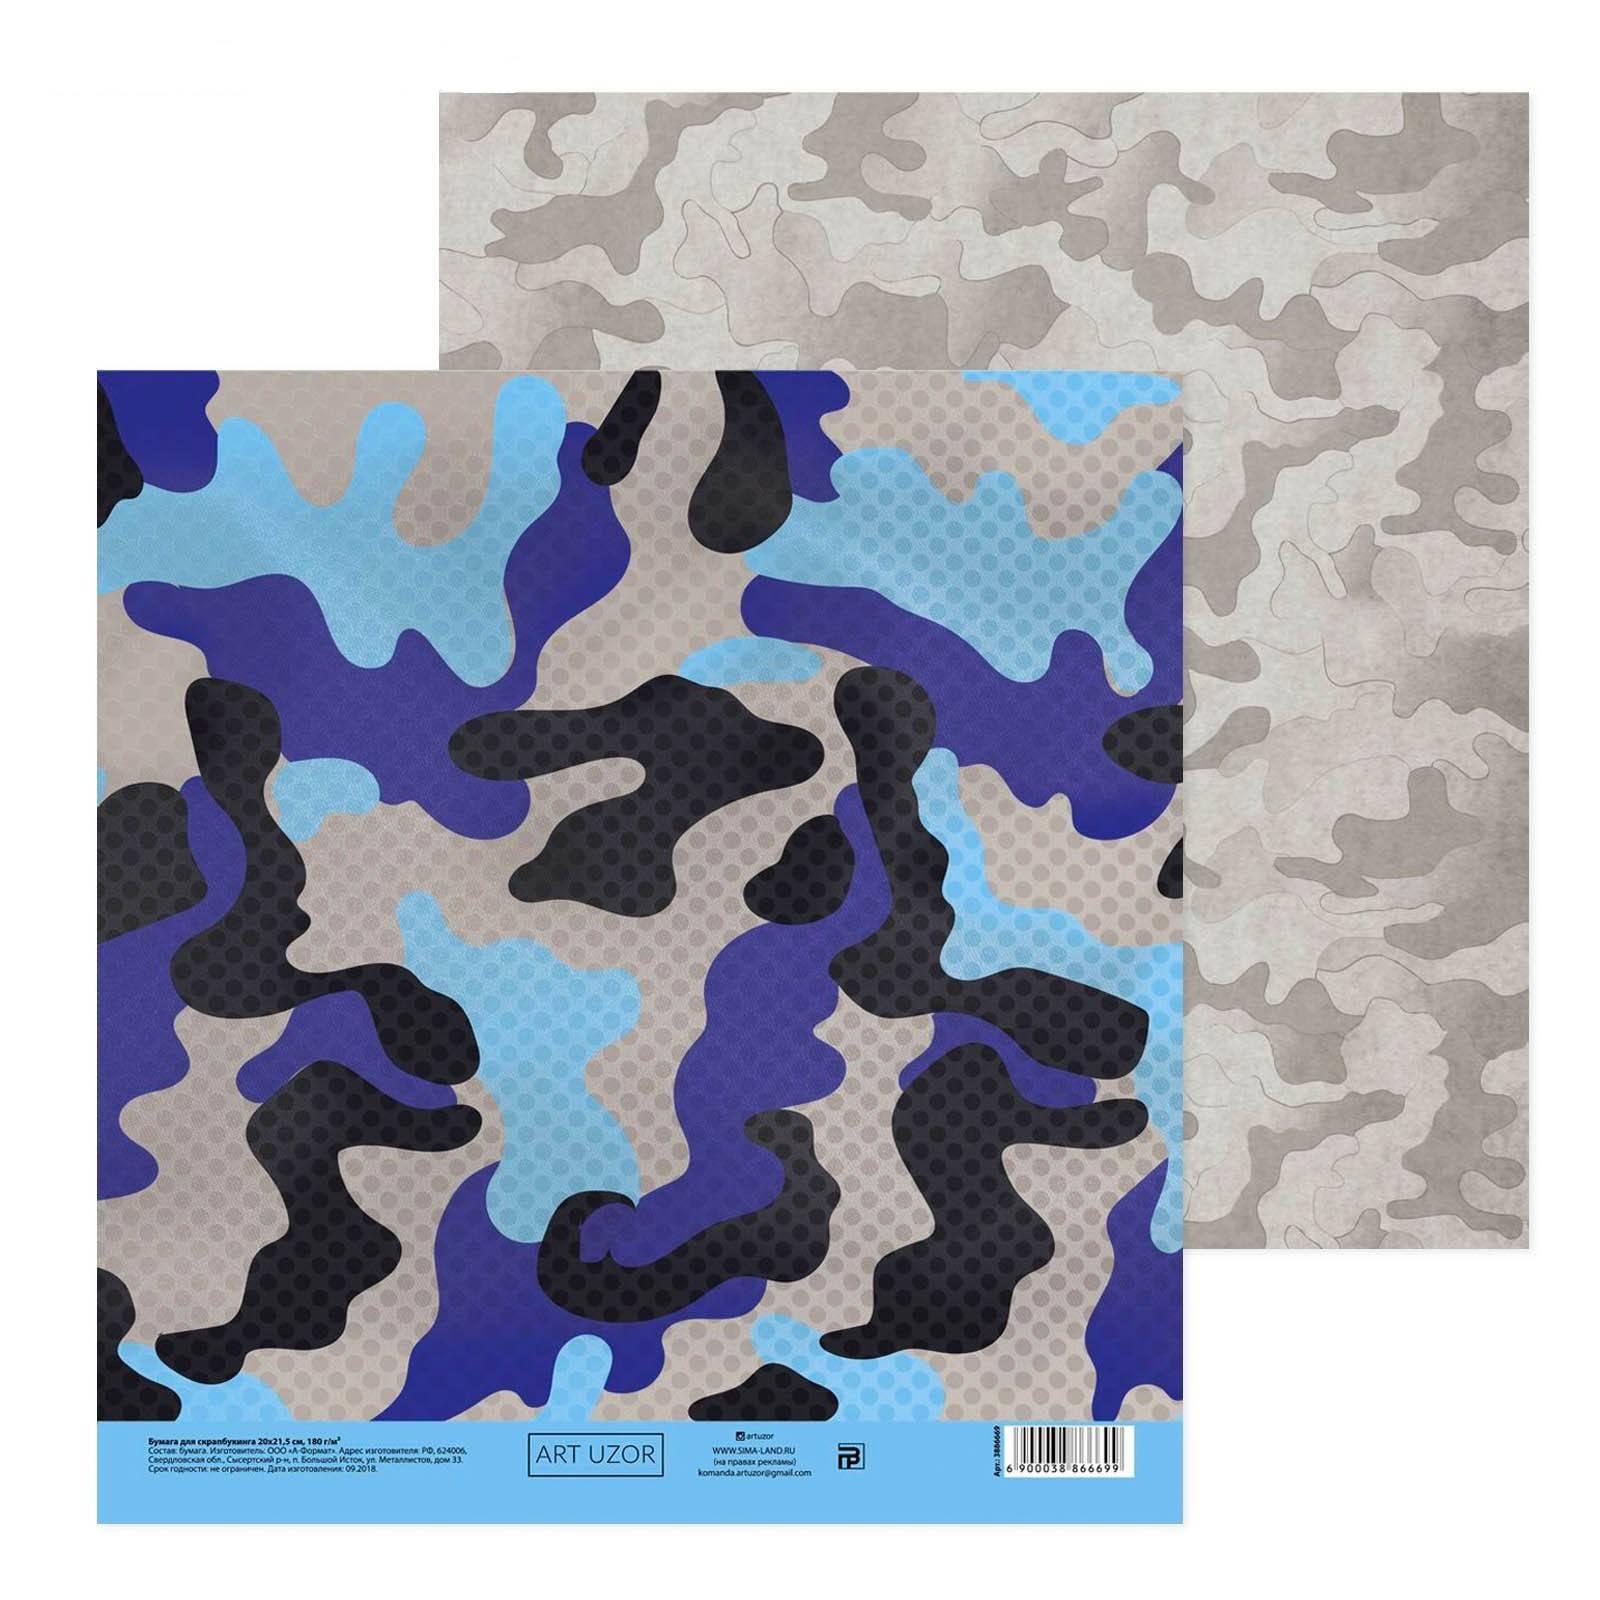 Бумага для скрапбукинга, Камуфляж, 20×21,5 см, 180 г/м, АртУзор